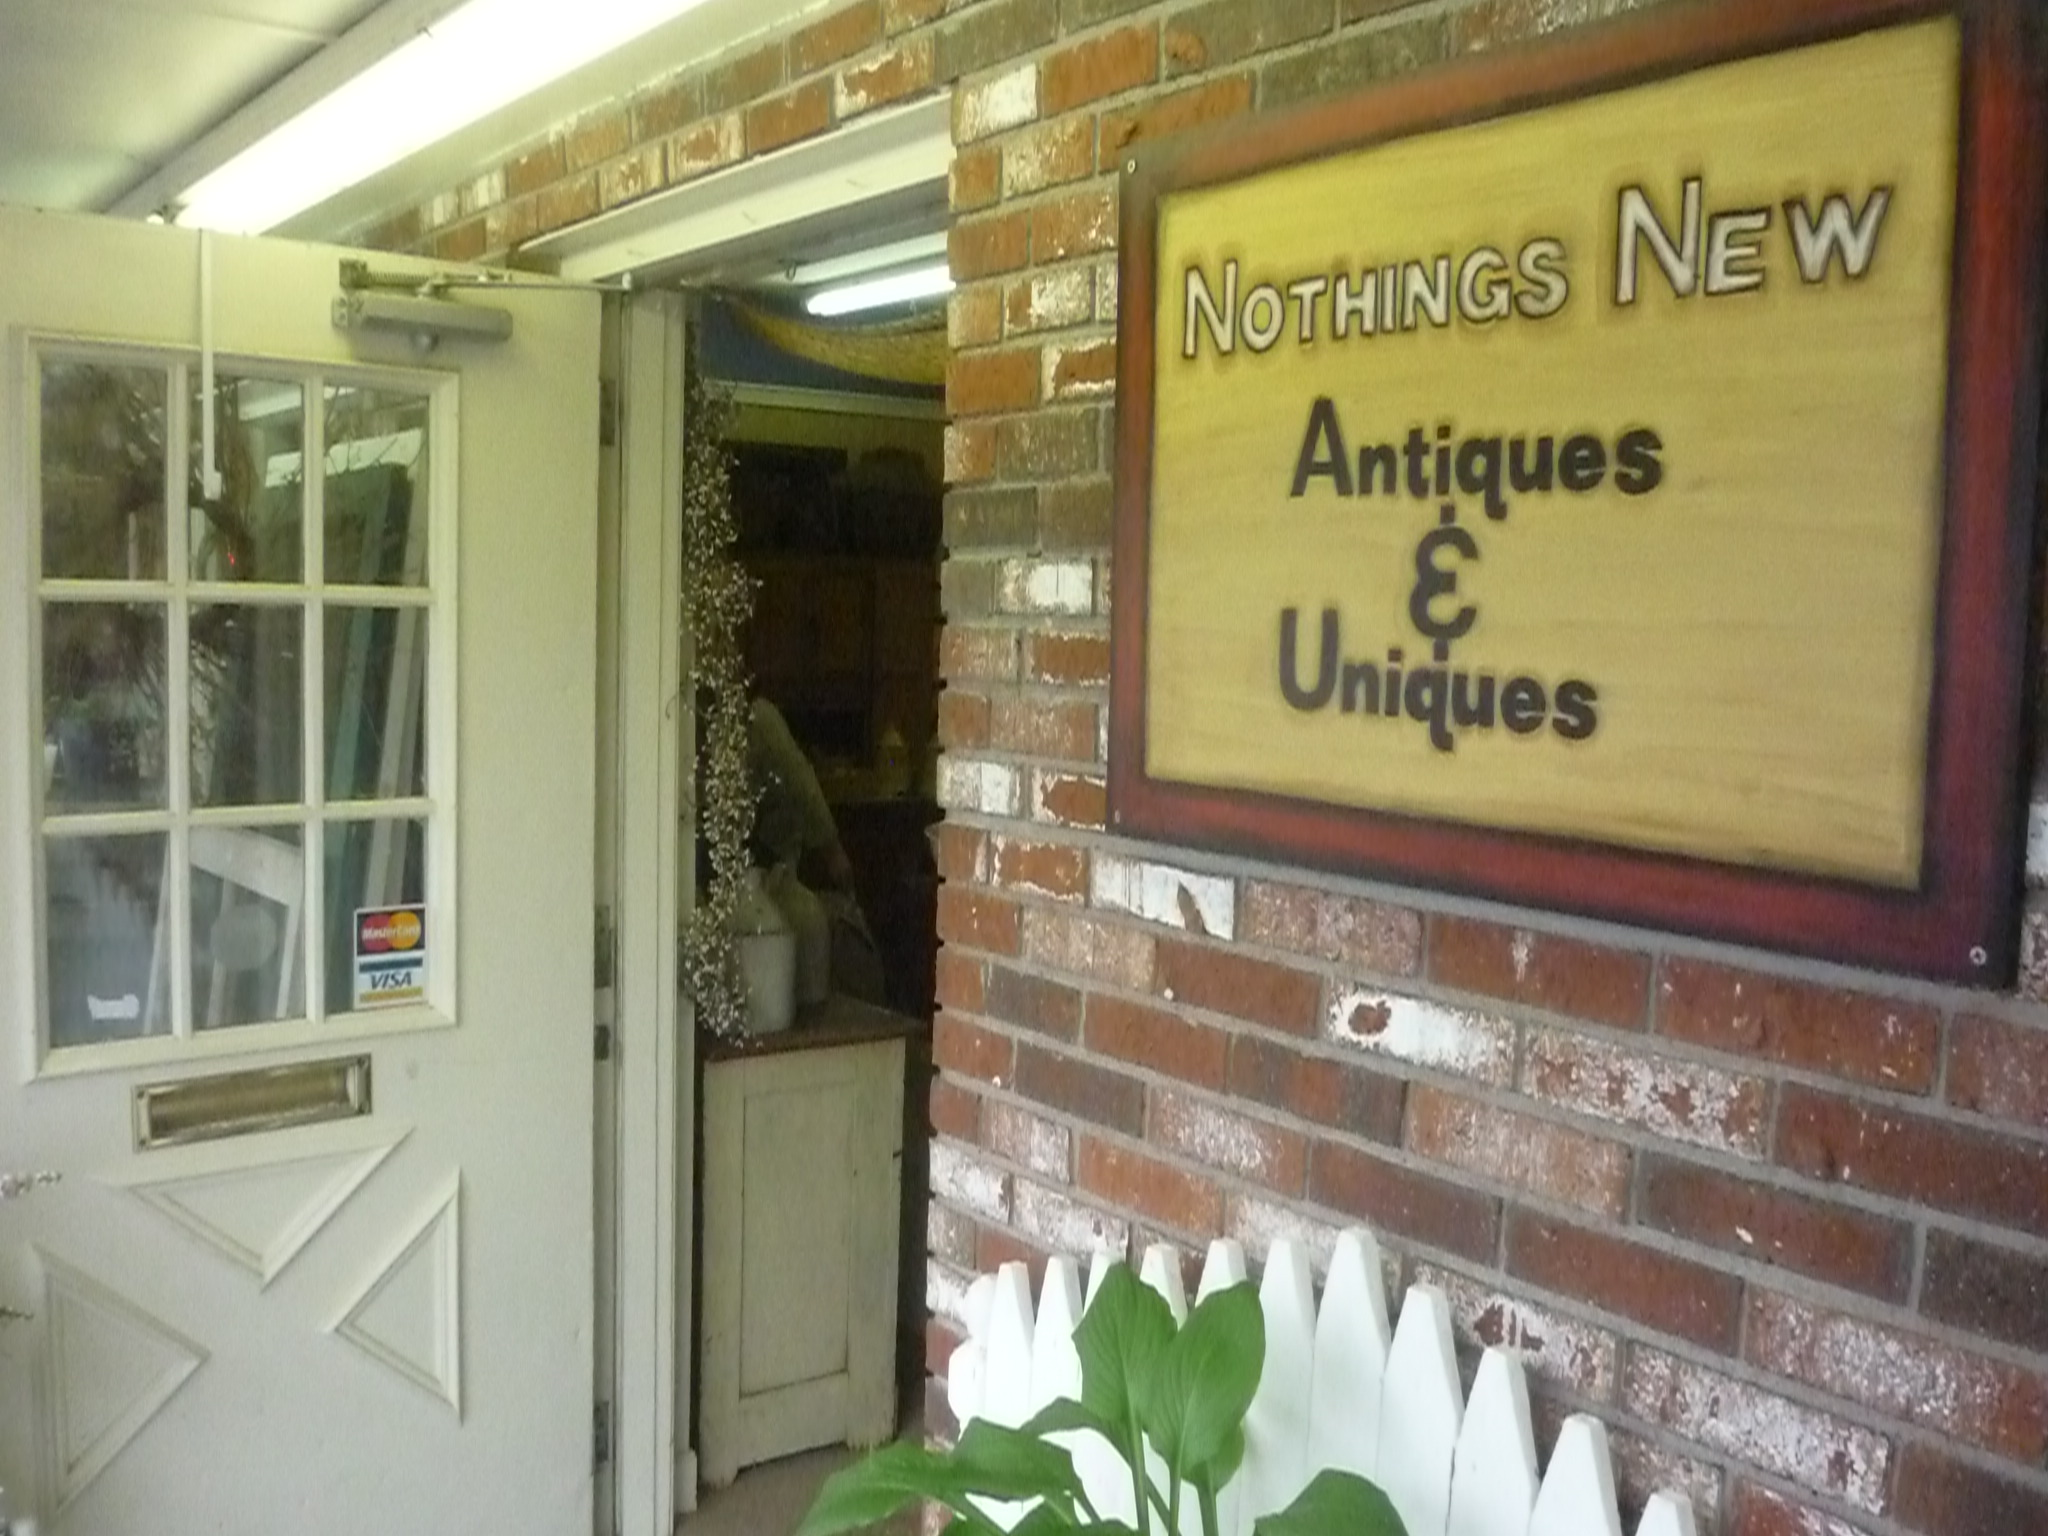 Nothings New, a Budget-Friendly, Hidden Gem Antique Store in Norfolk, Mass.